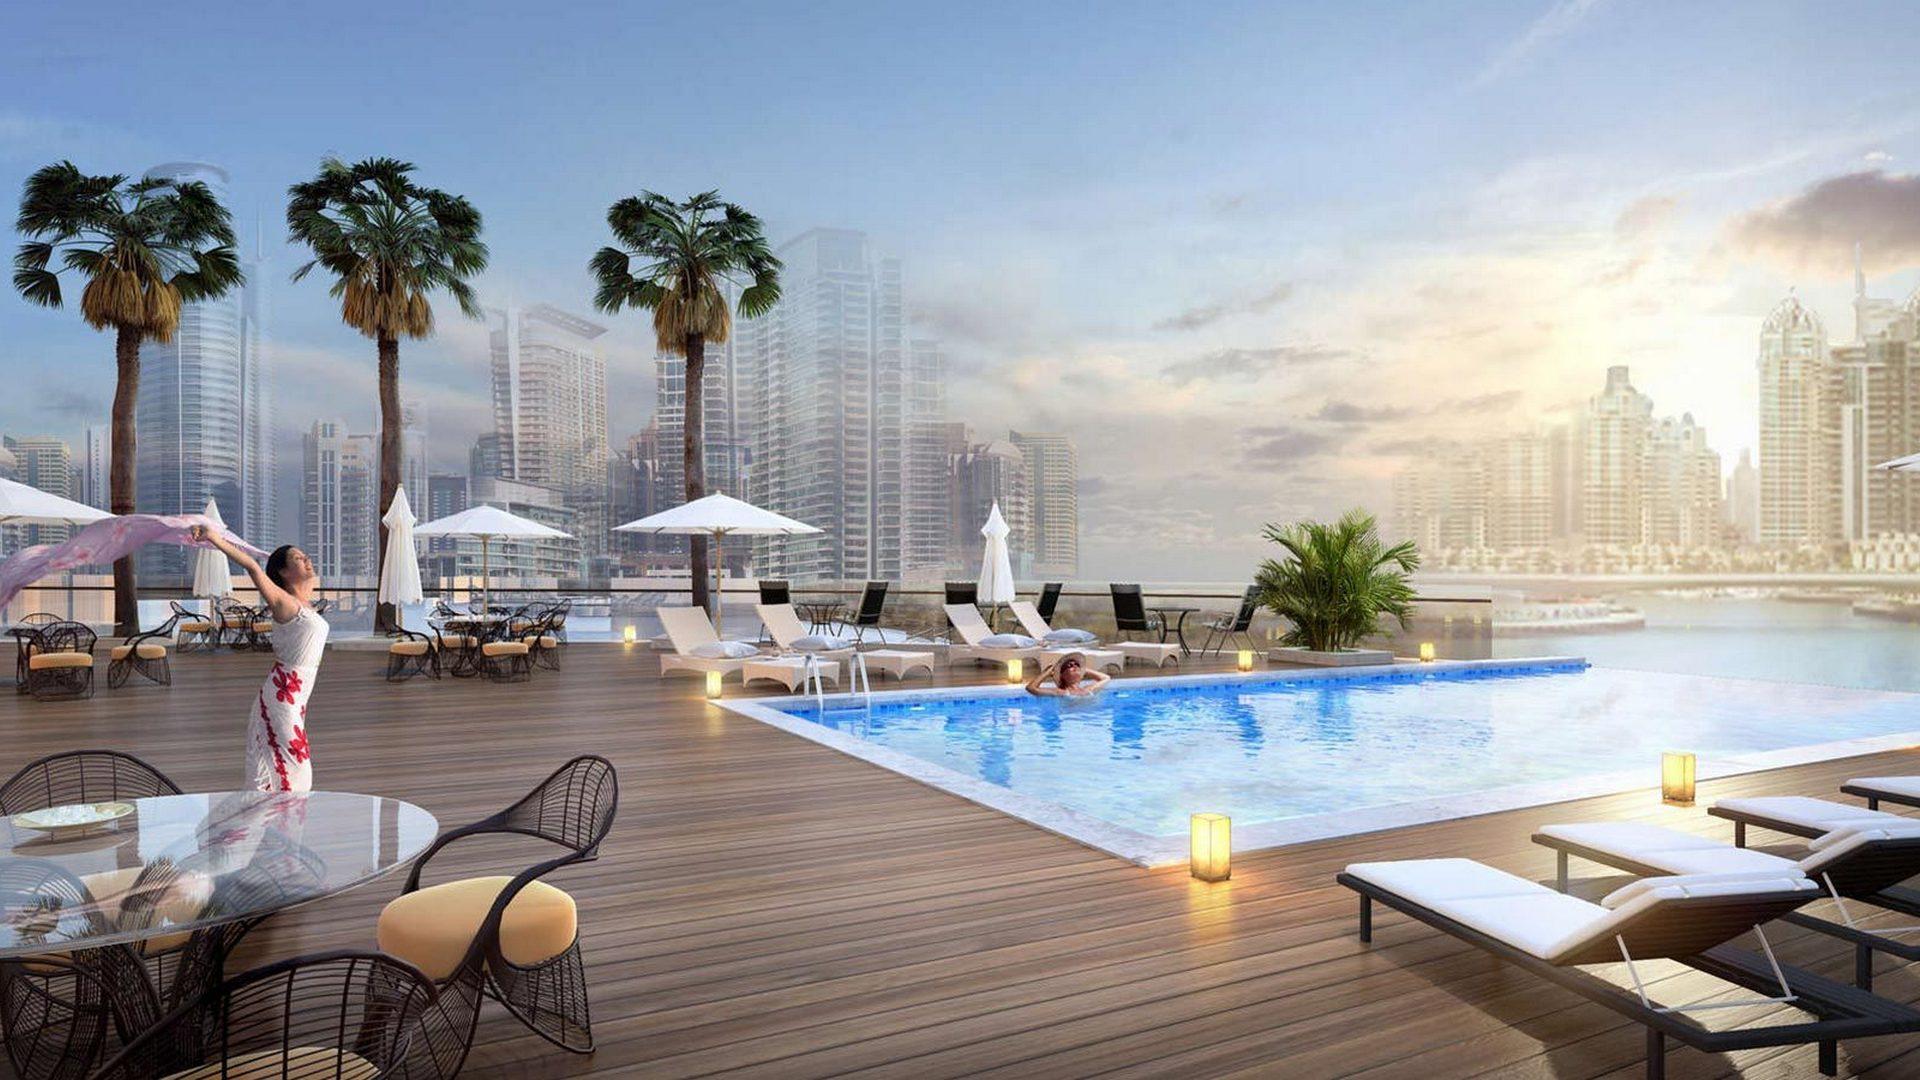 LIV RESIDENCE, Dubai Marina, UAE – photo 4